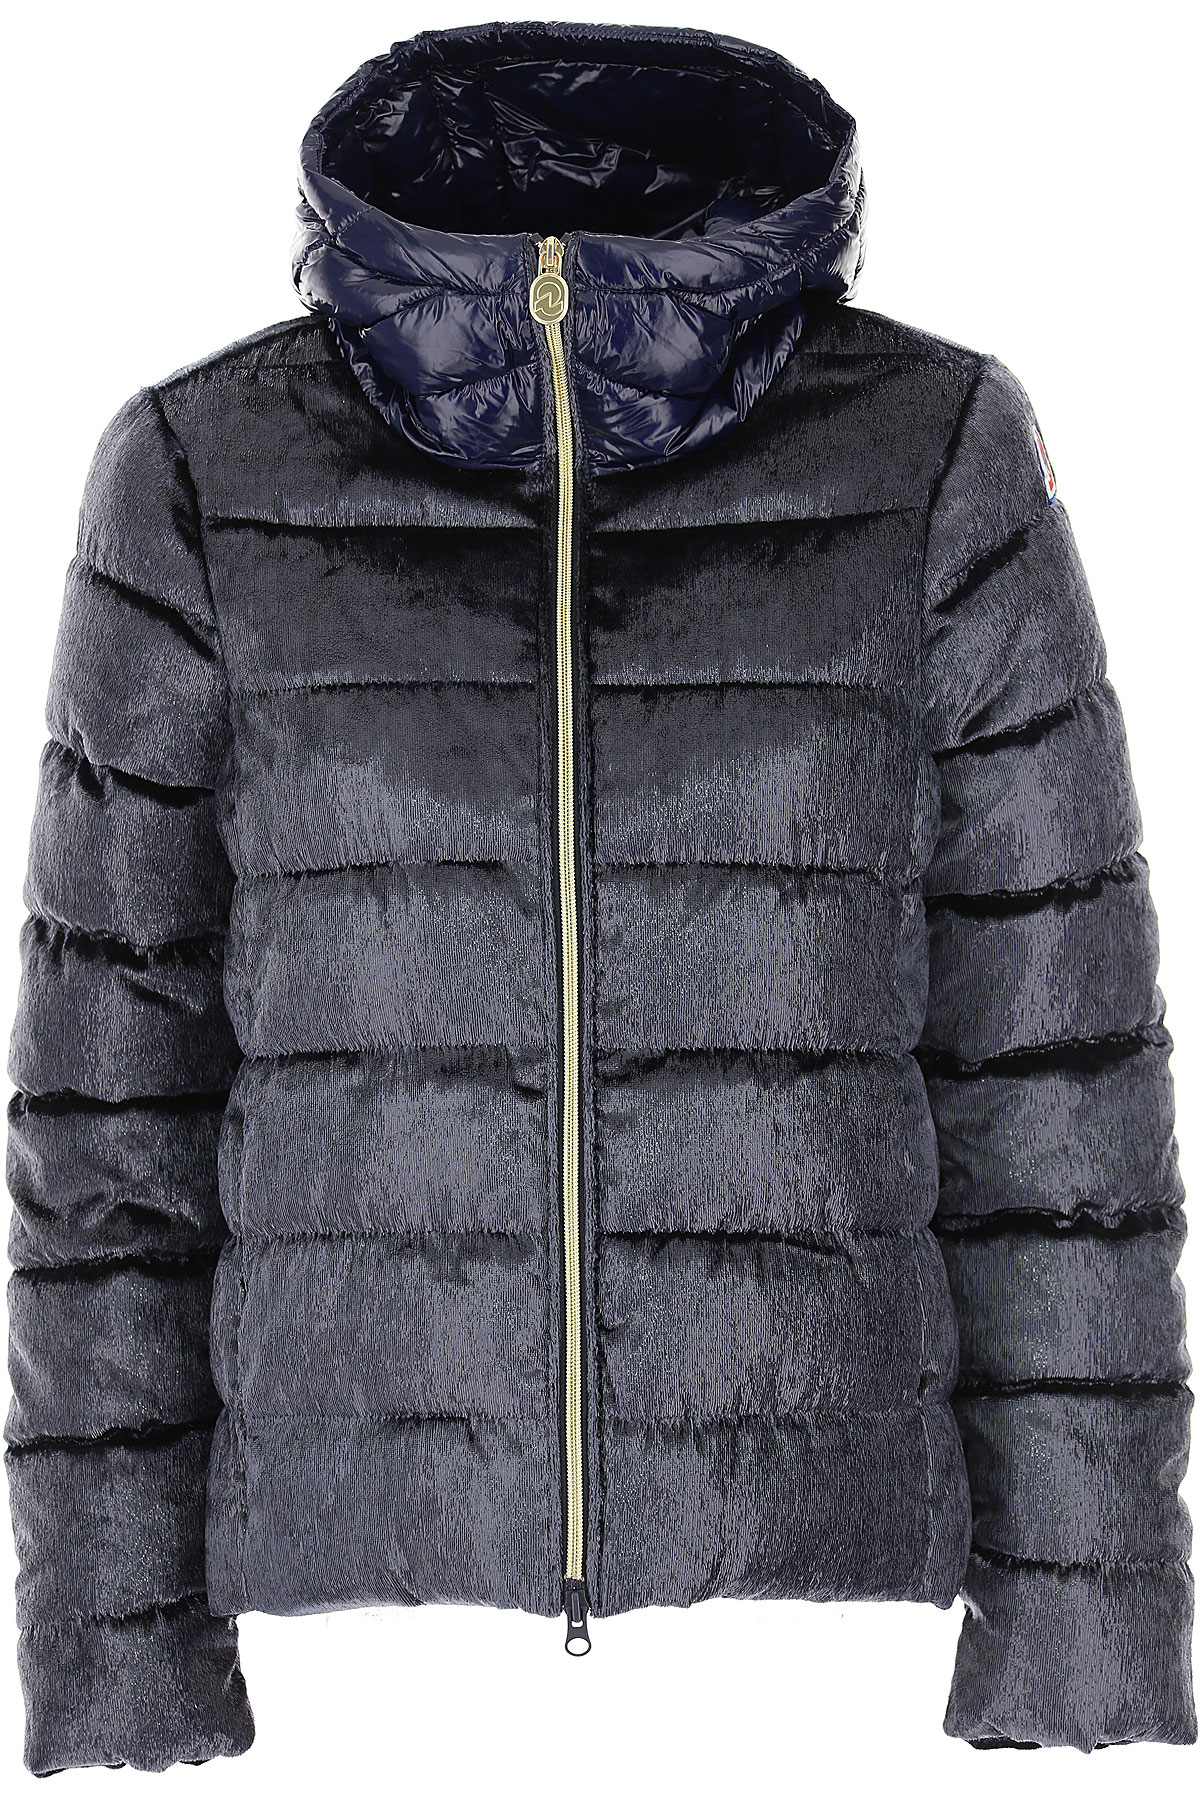 Invicta Jacket for Women On Sale, Dark Electric Blue, polyamide, 2019, 10 2 4 6 8